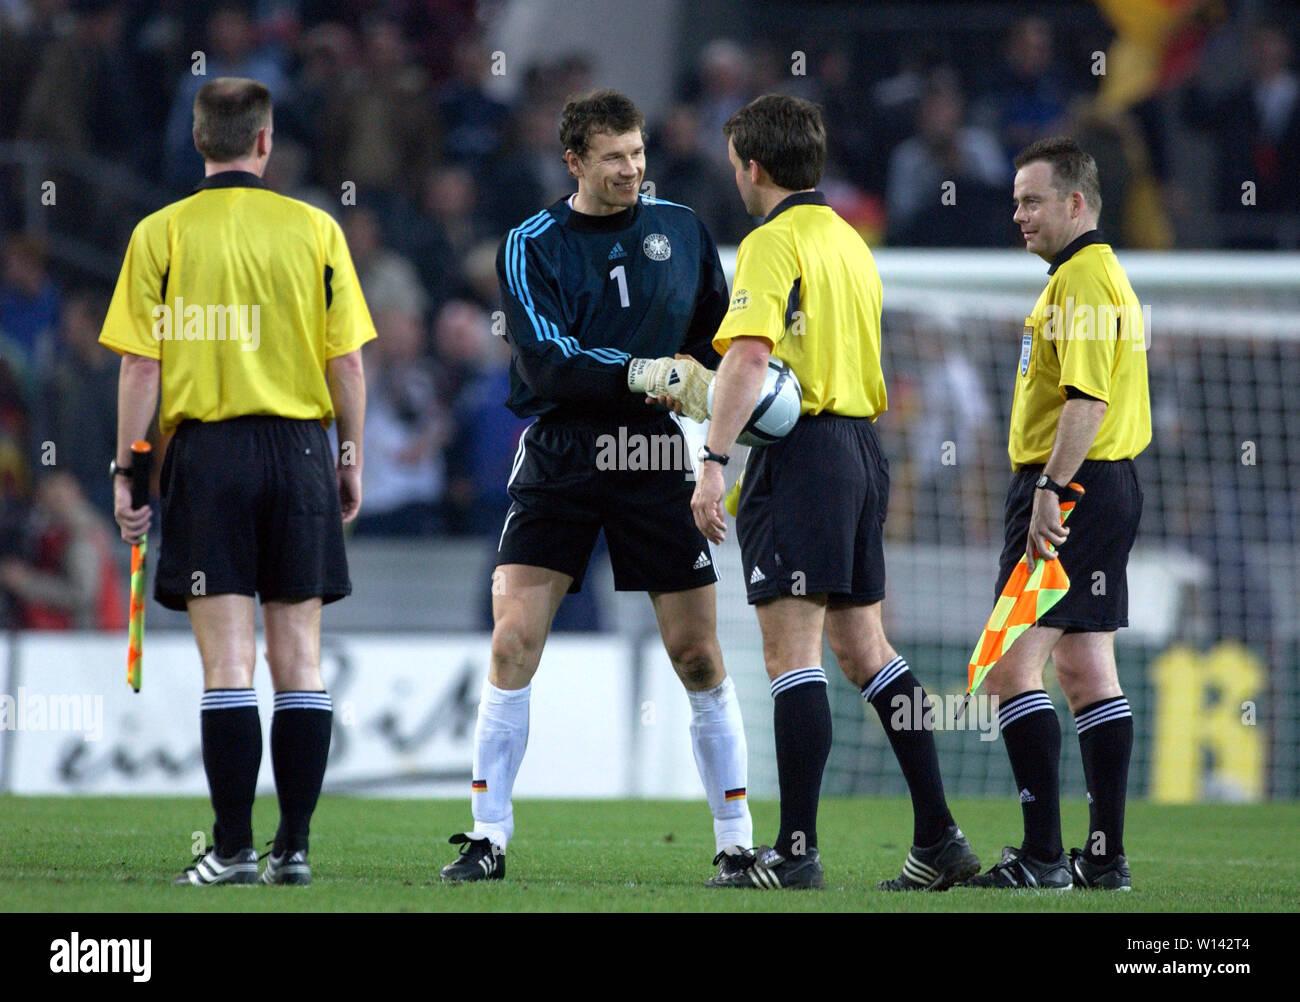 Rhein-Energie-Stadion Cologne Germany, 31.3.2004, Football: International friendly, Germany (white) vs. Belgium (red) 3:0 --- goalkeeper Jens Lehmann  (GER) shakes hands with referee Jan Wegereef (NED) Stock Photo